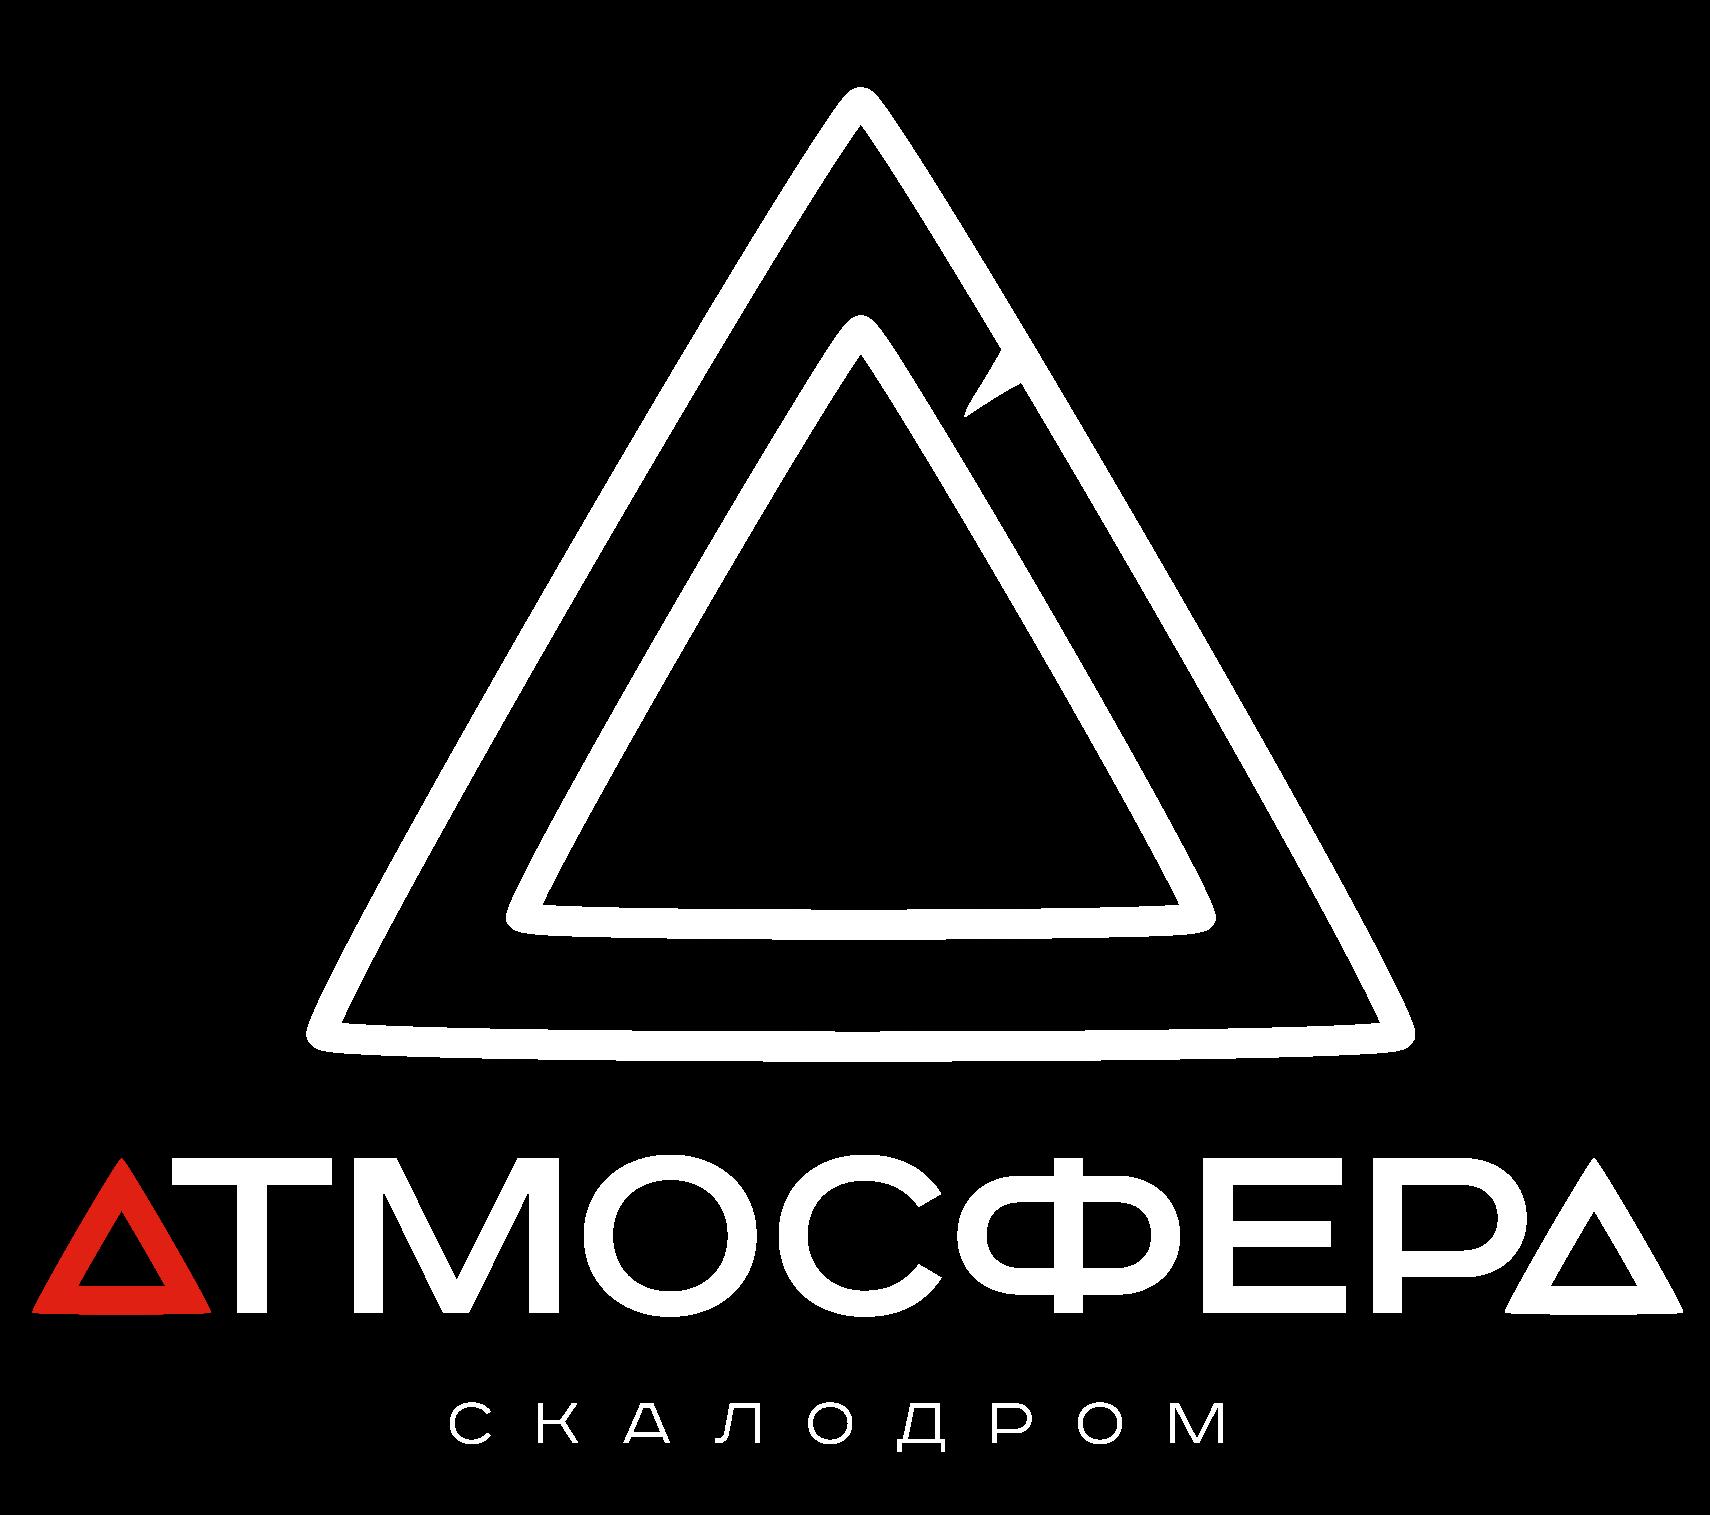 Скалодром «Атмосфера»